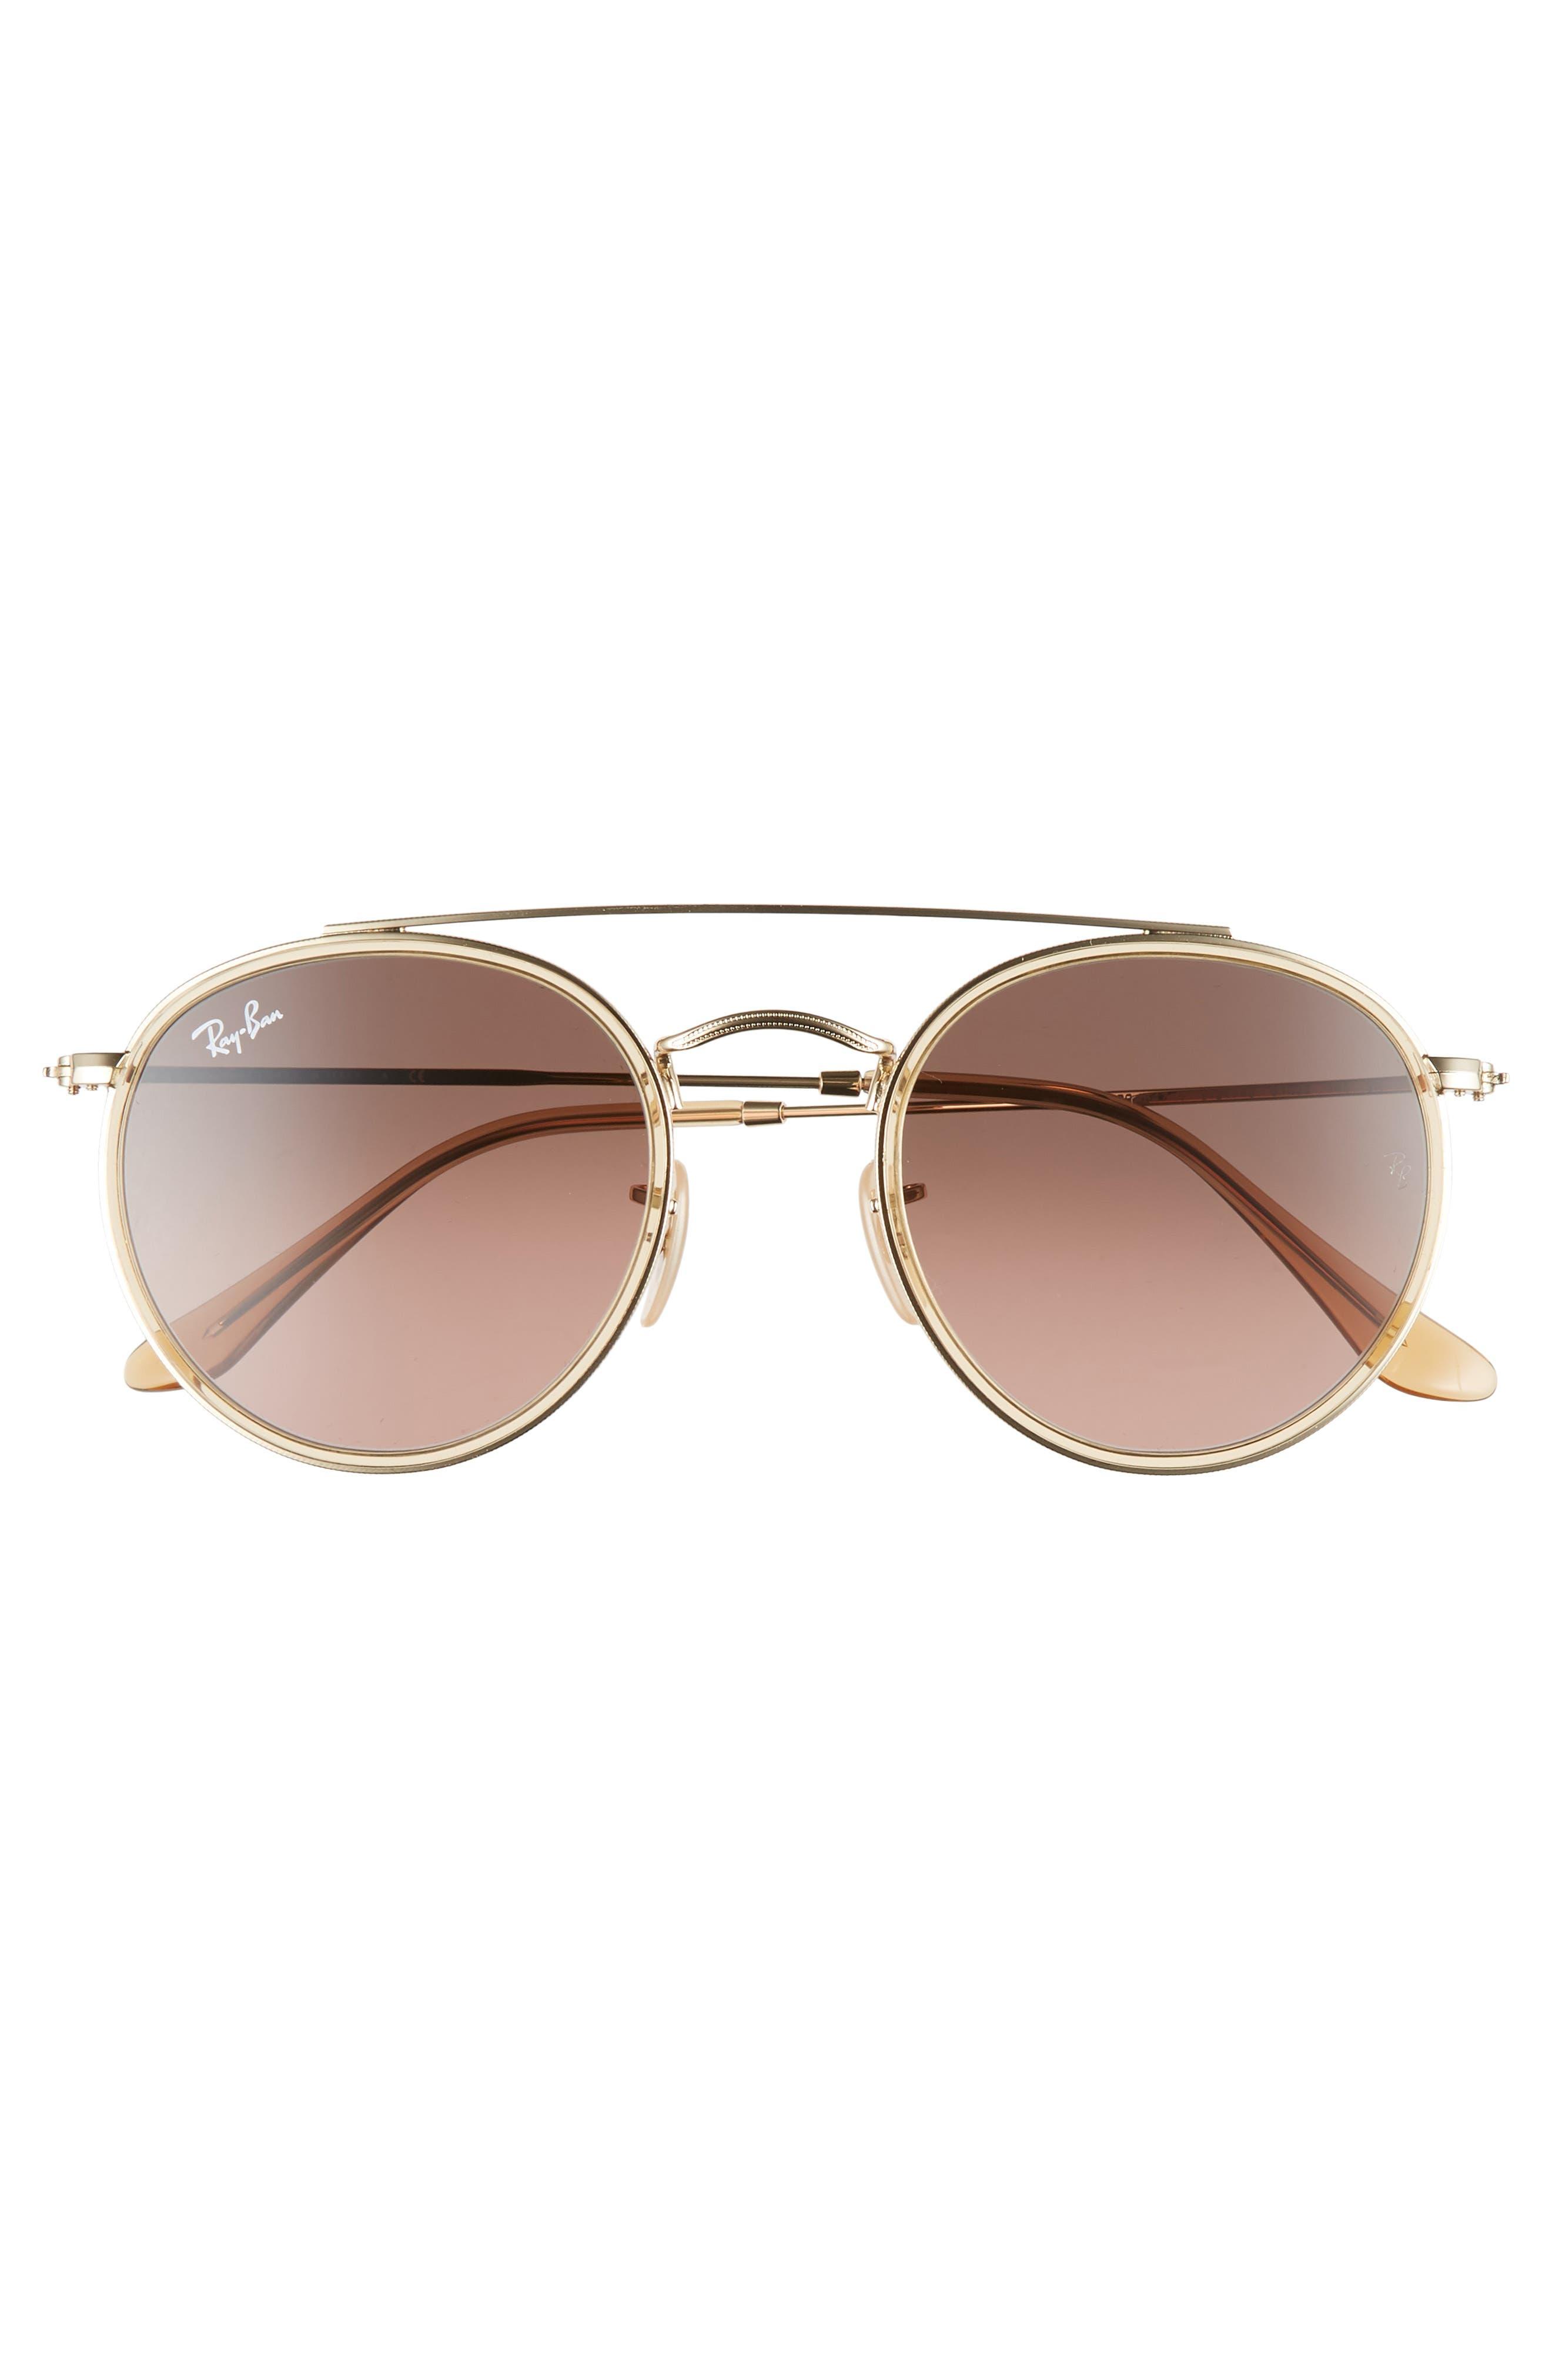 51mm Aviator Gradient Lens Sunglasses,                             Alternate thumbnail 3, color,                             GOLD/ BROWN GRADIENT